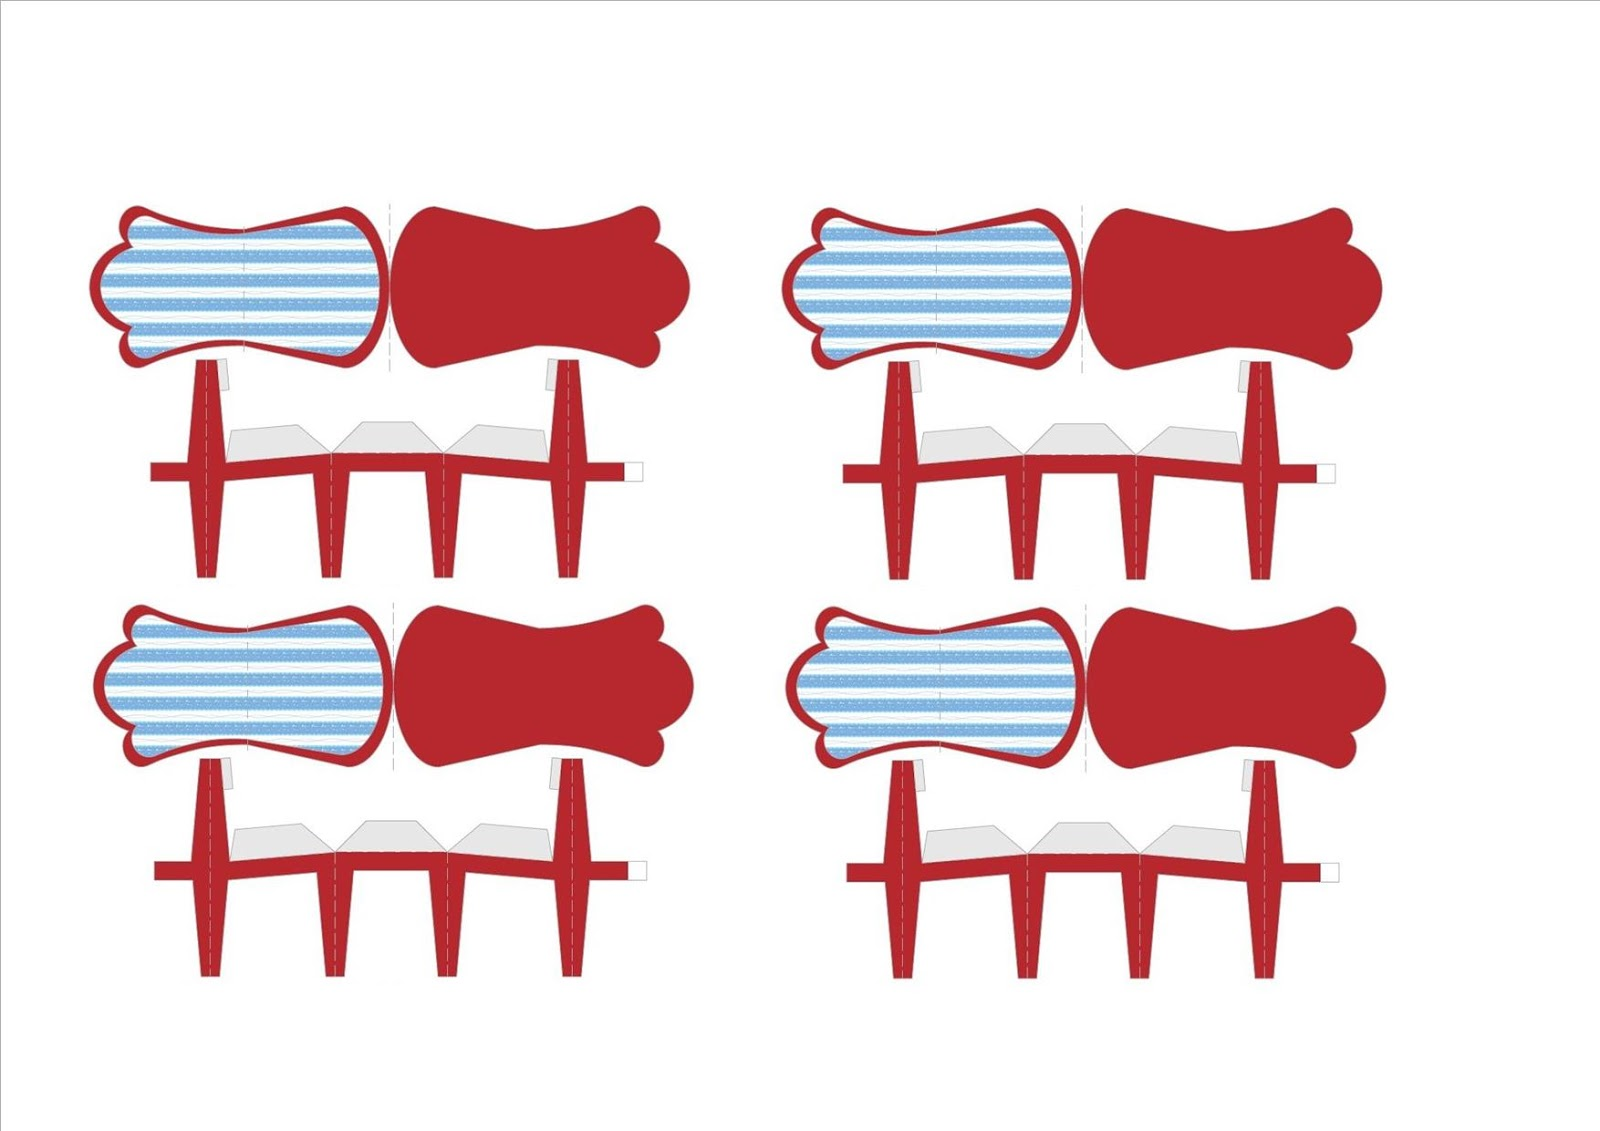 Extremamente Meninice Aguda: Moldes de papel para imprimir, cortar, colar e criar. EQ45